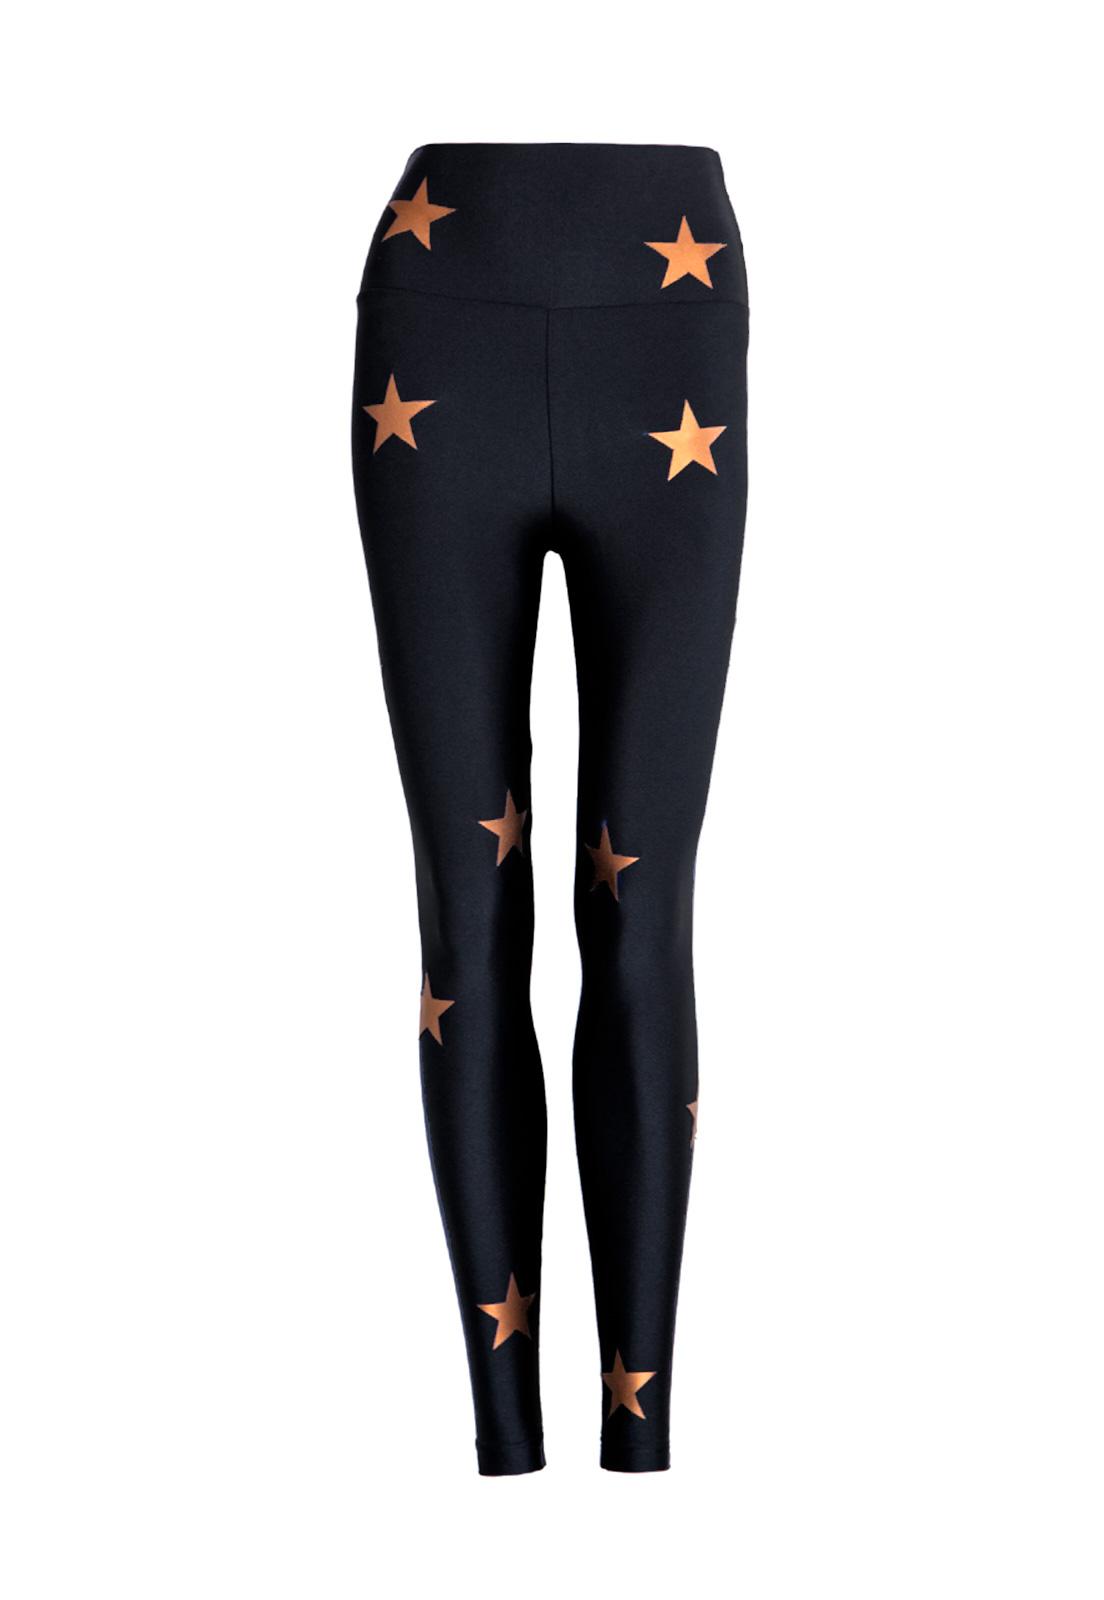 Calzas Gold Stars - Image 2